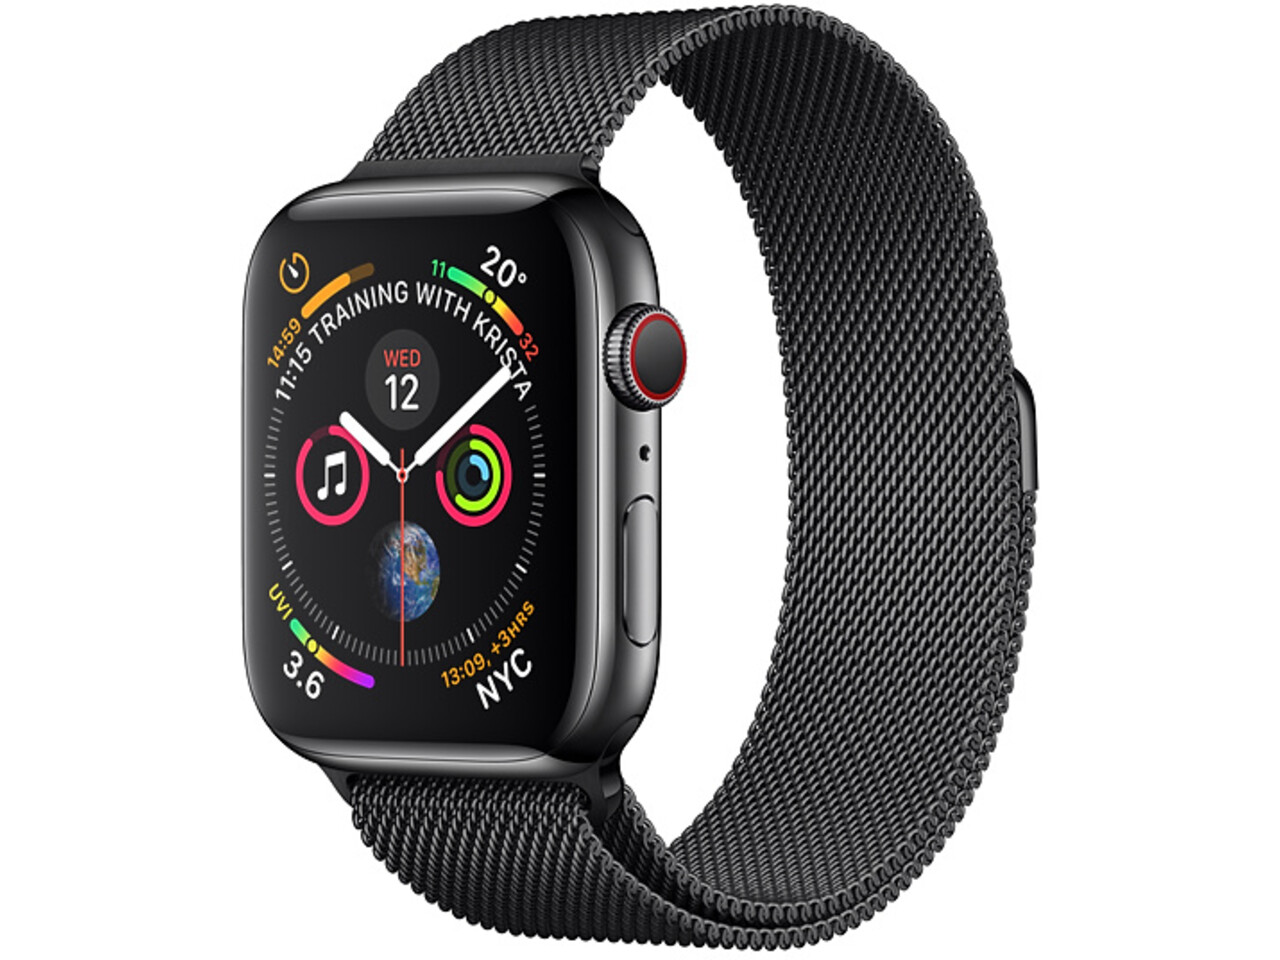 apple watch series 4 cellular 44mm space black stainless steel space black stainless steel